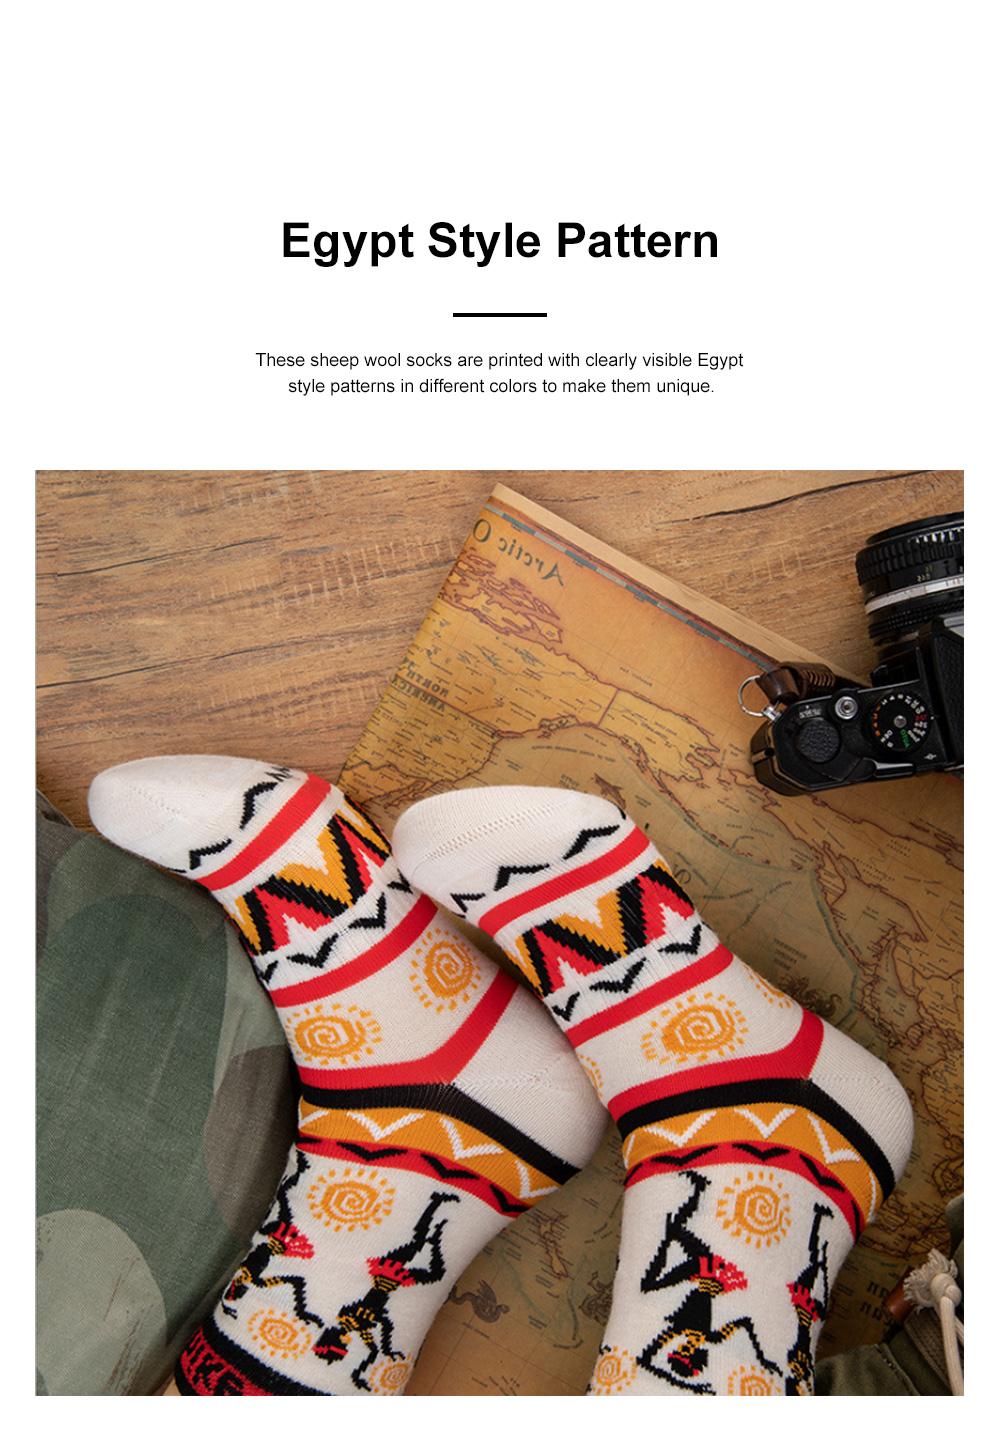 Naturehike Travelling Socks for Multiple Outdoors Activities Merino Sheep Wool Socks Breathable and Moisture-wicking Sports Socks 1